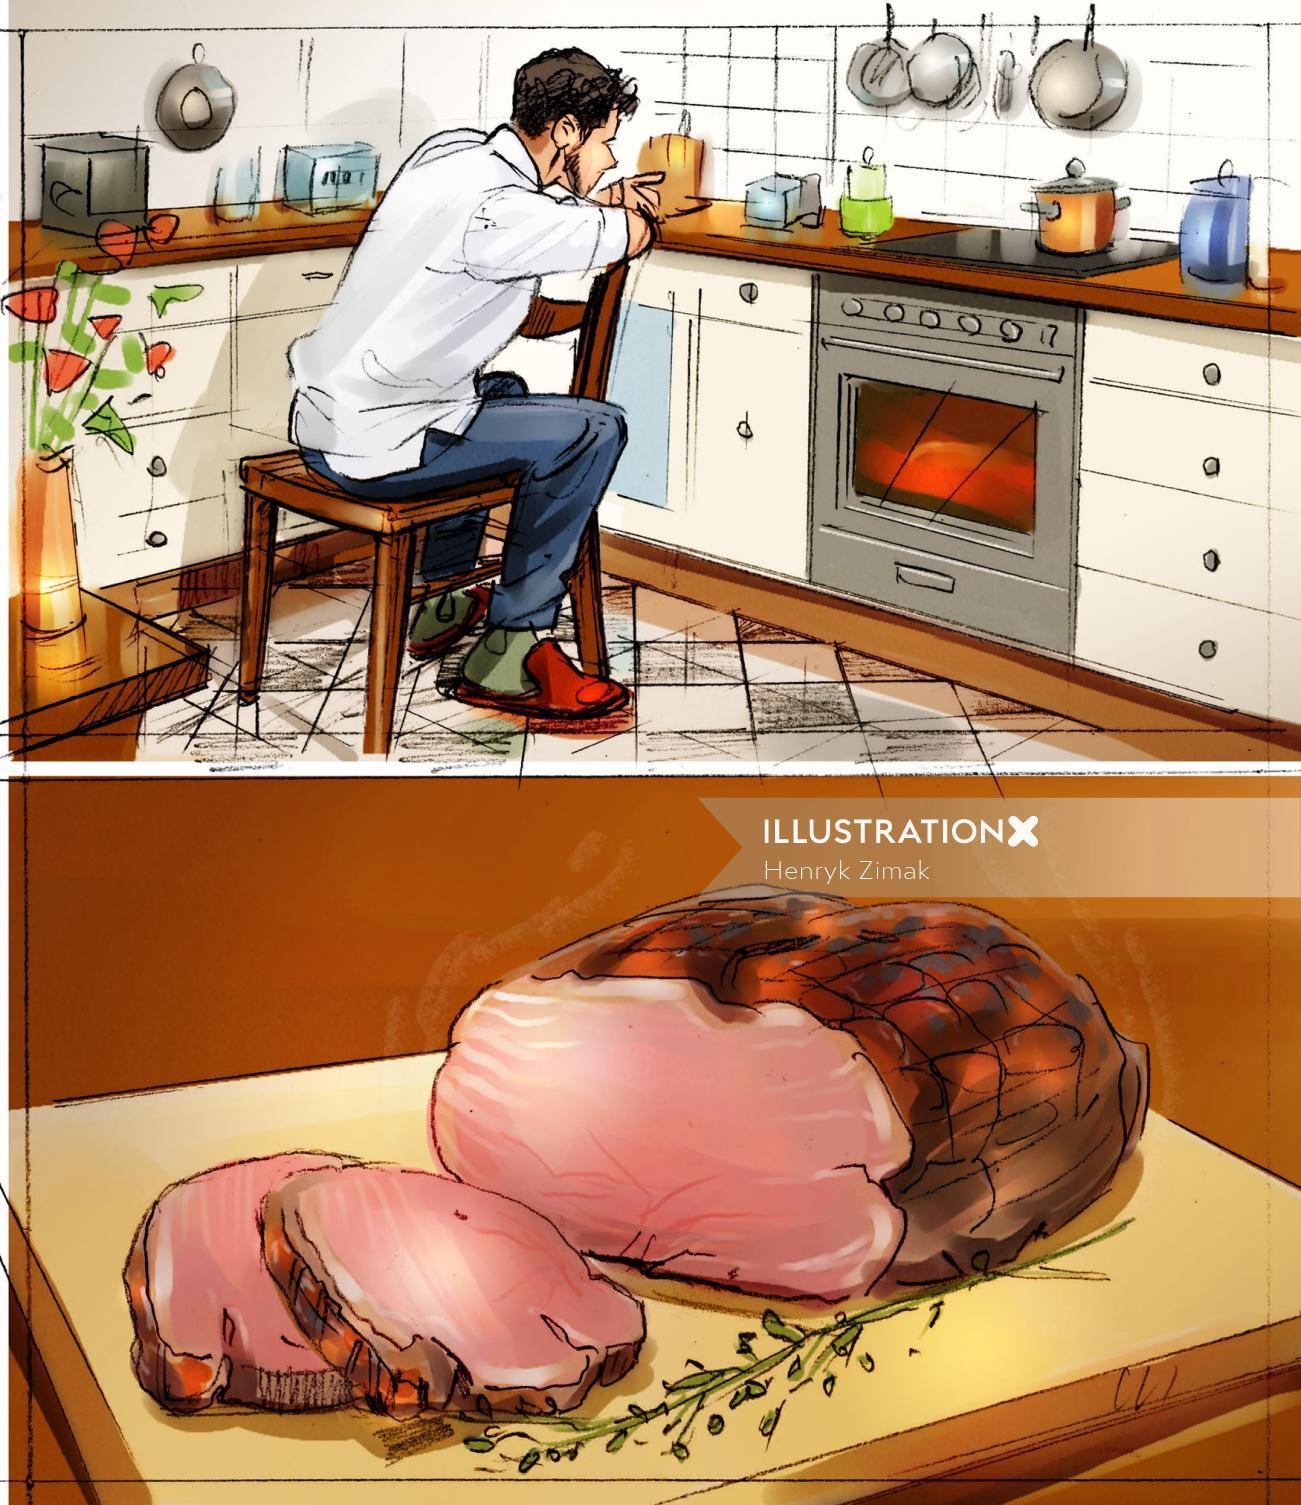 Storyboard illustration of cutting chicken